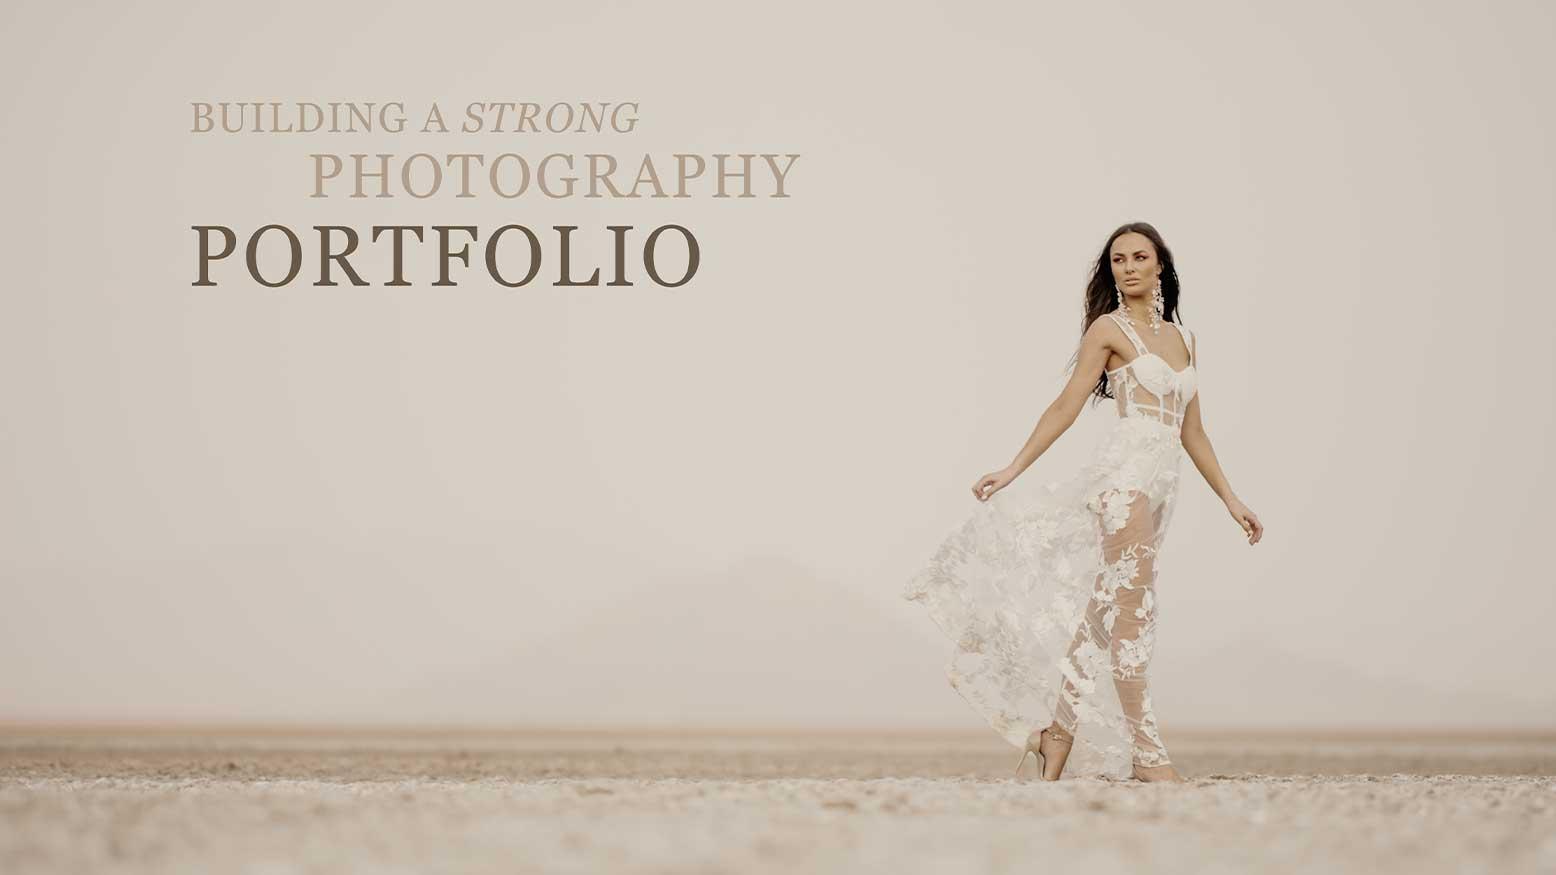 Building a Strong Photography Portfolio